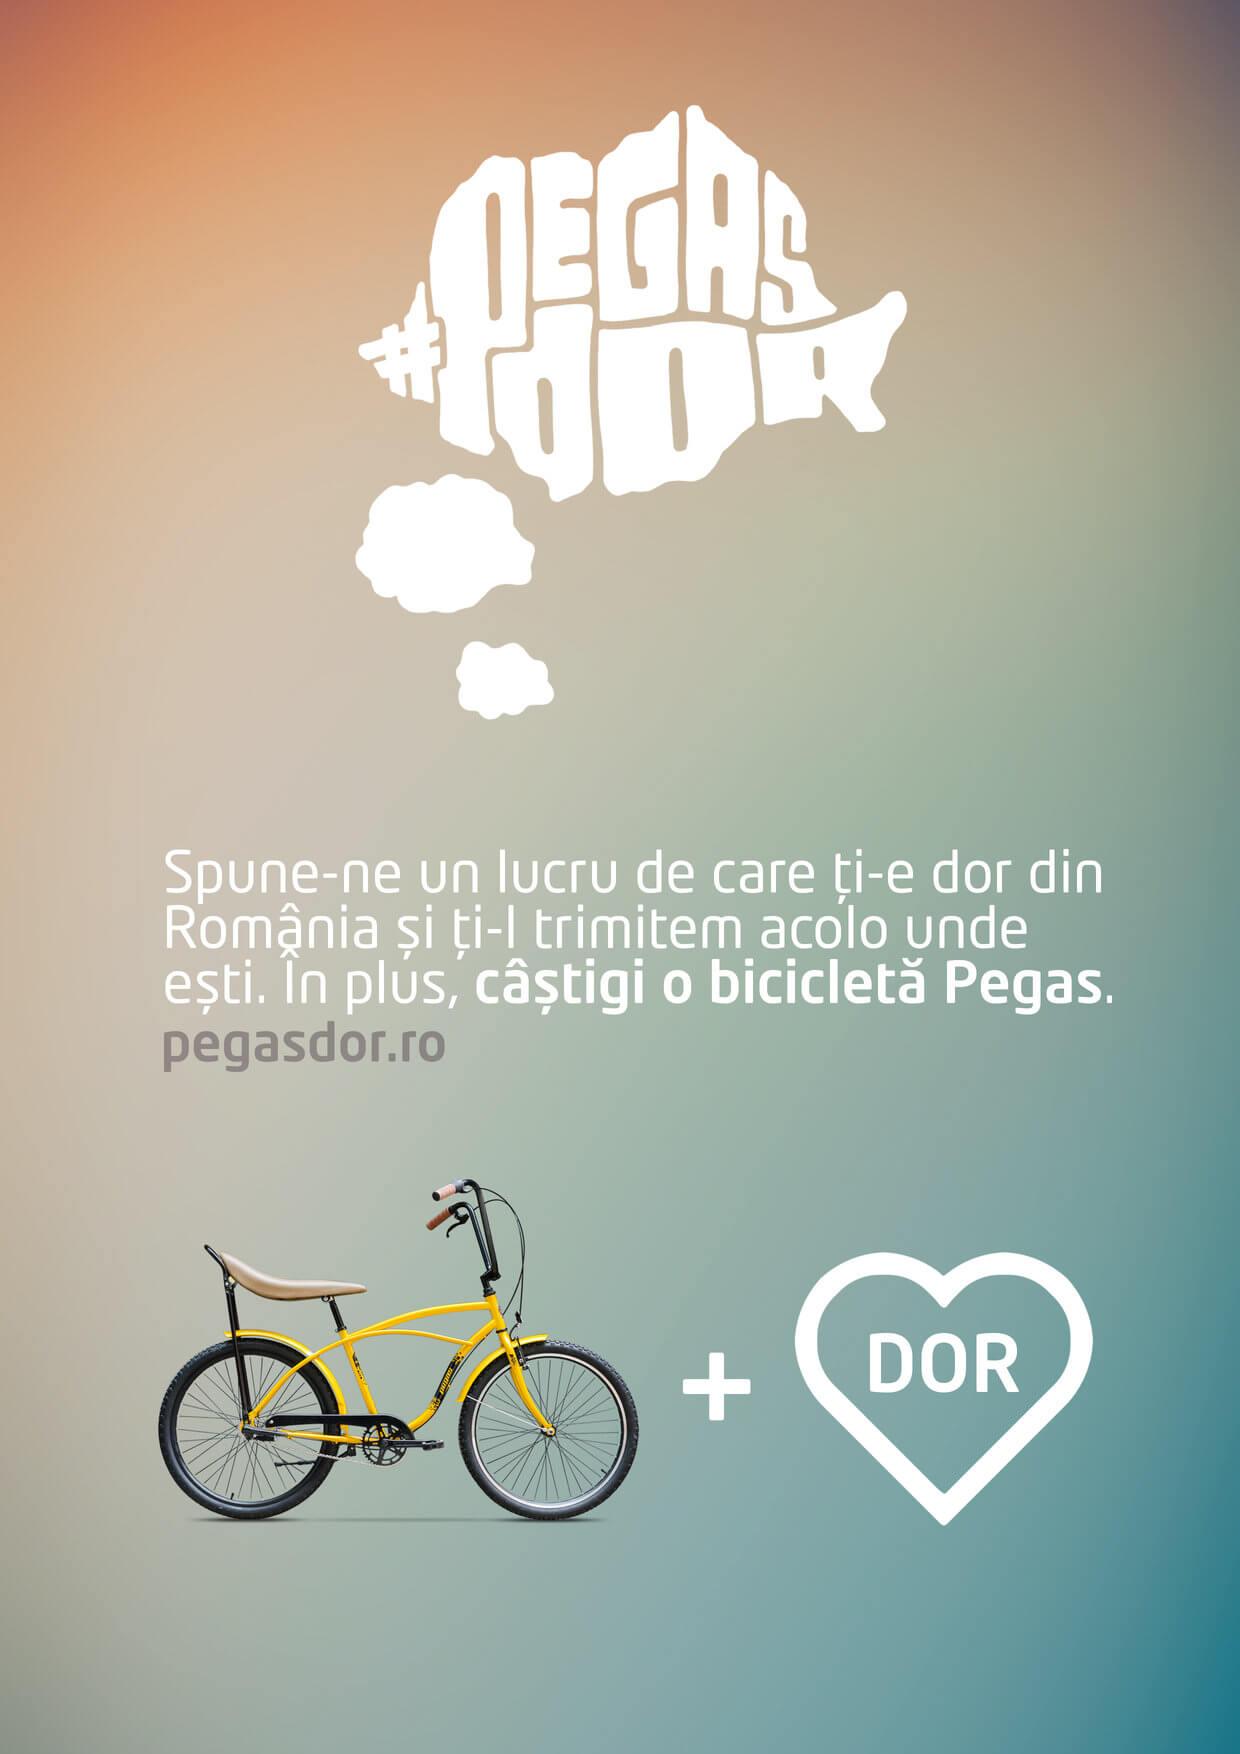 rsz_#pegasdor